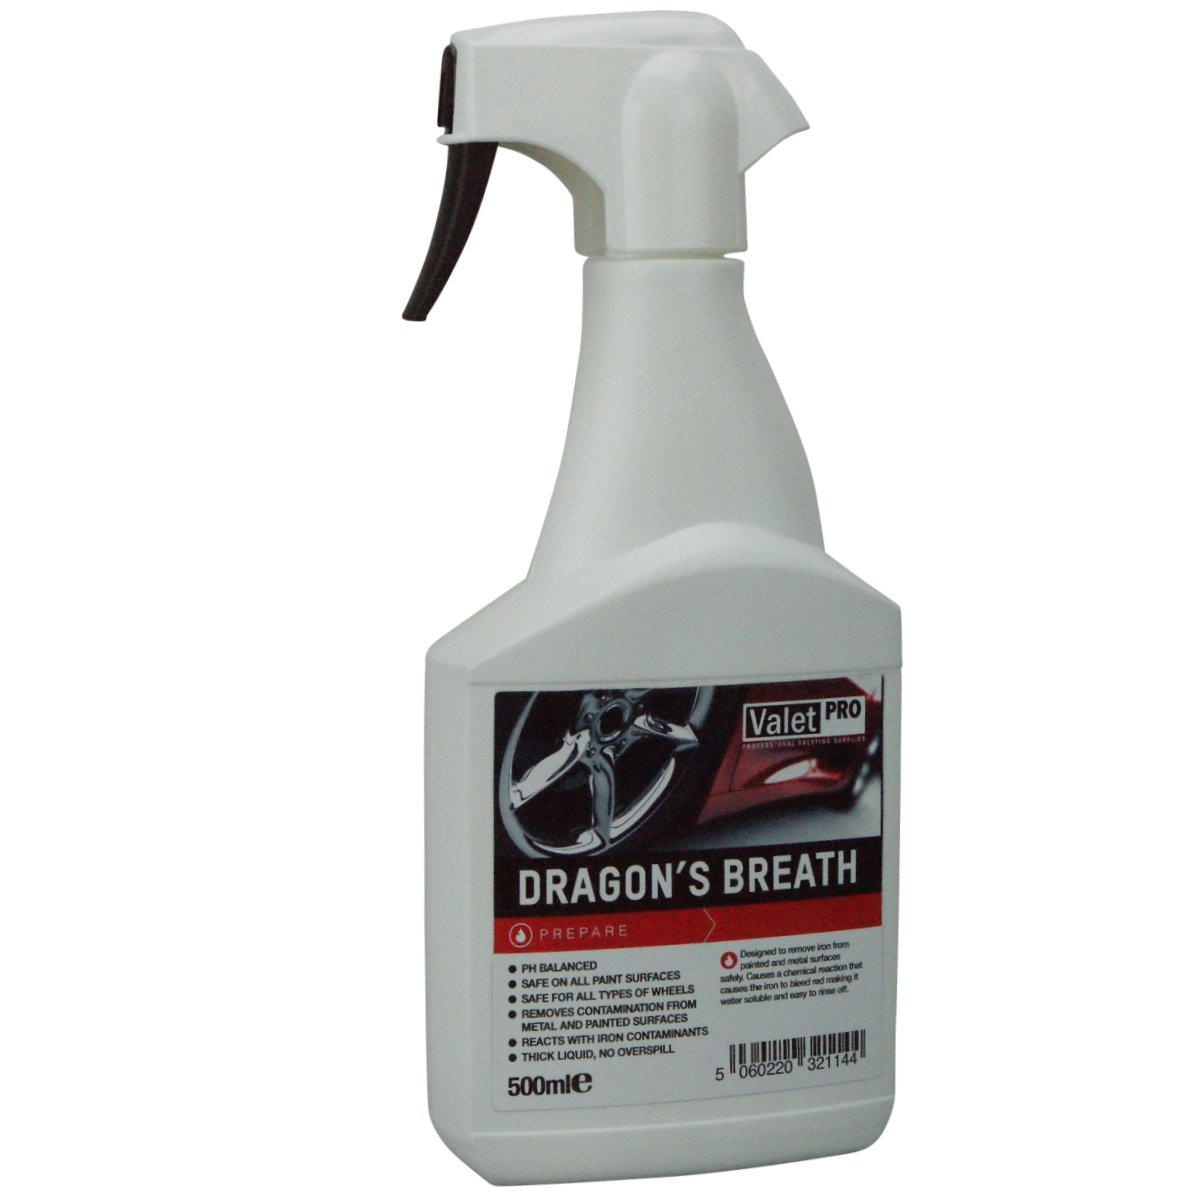 Valet Pro Dragon's Breath Iron Contamination Remover 500ml ValetPRO